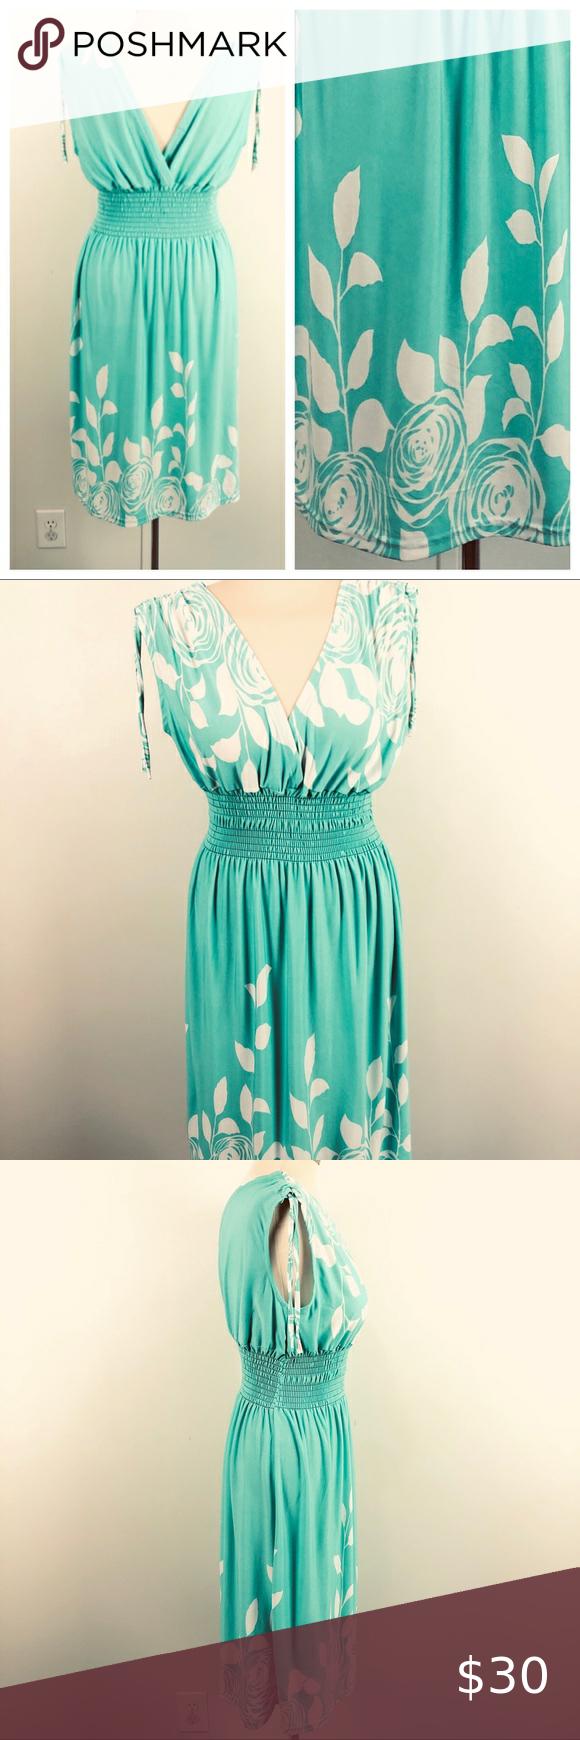 Summer Dress Stretchy Elastic Bodice Surplice Bust Summer Dresses White Knee Length Dress Pleated Shift Dress [ 1740 x 580 Pixel ]